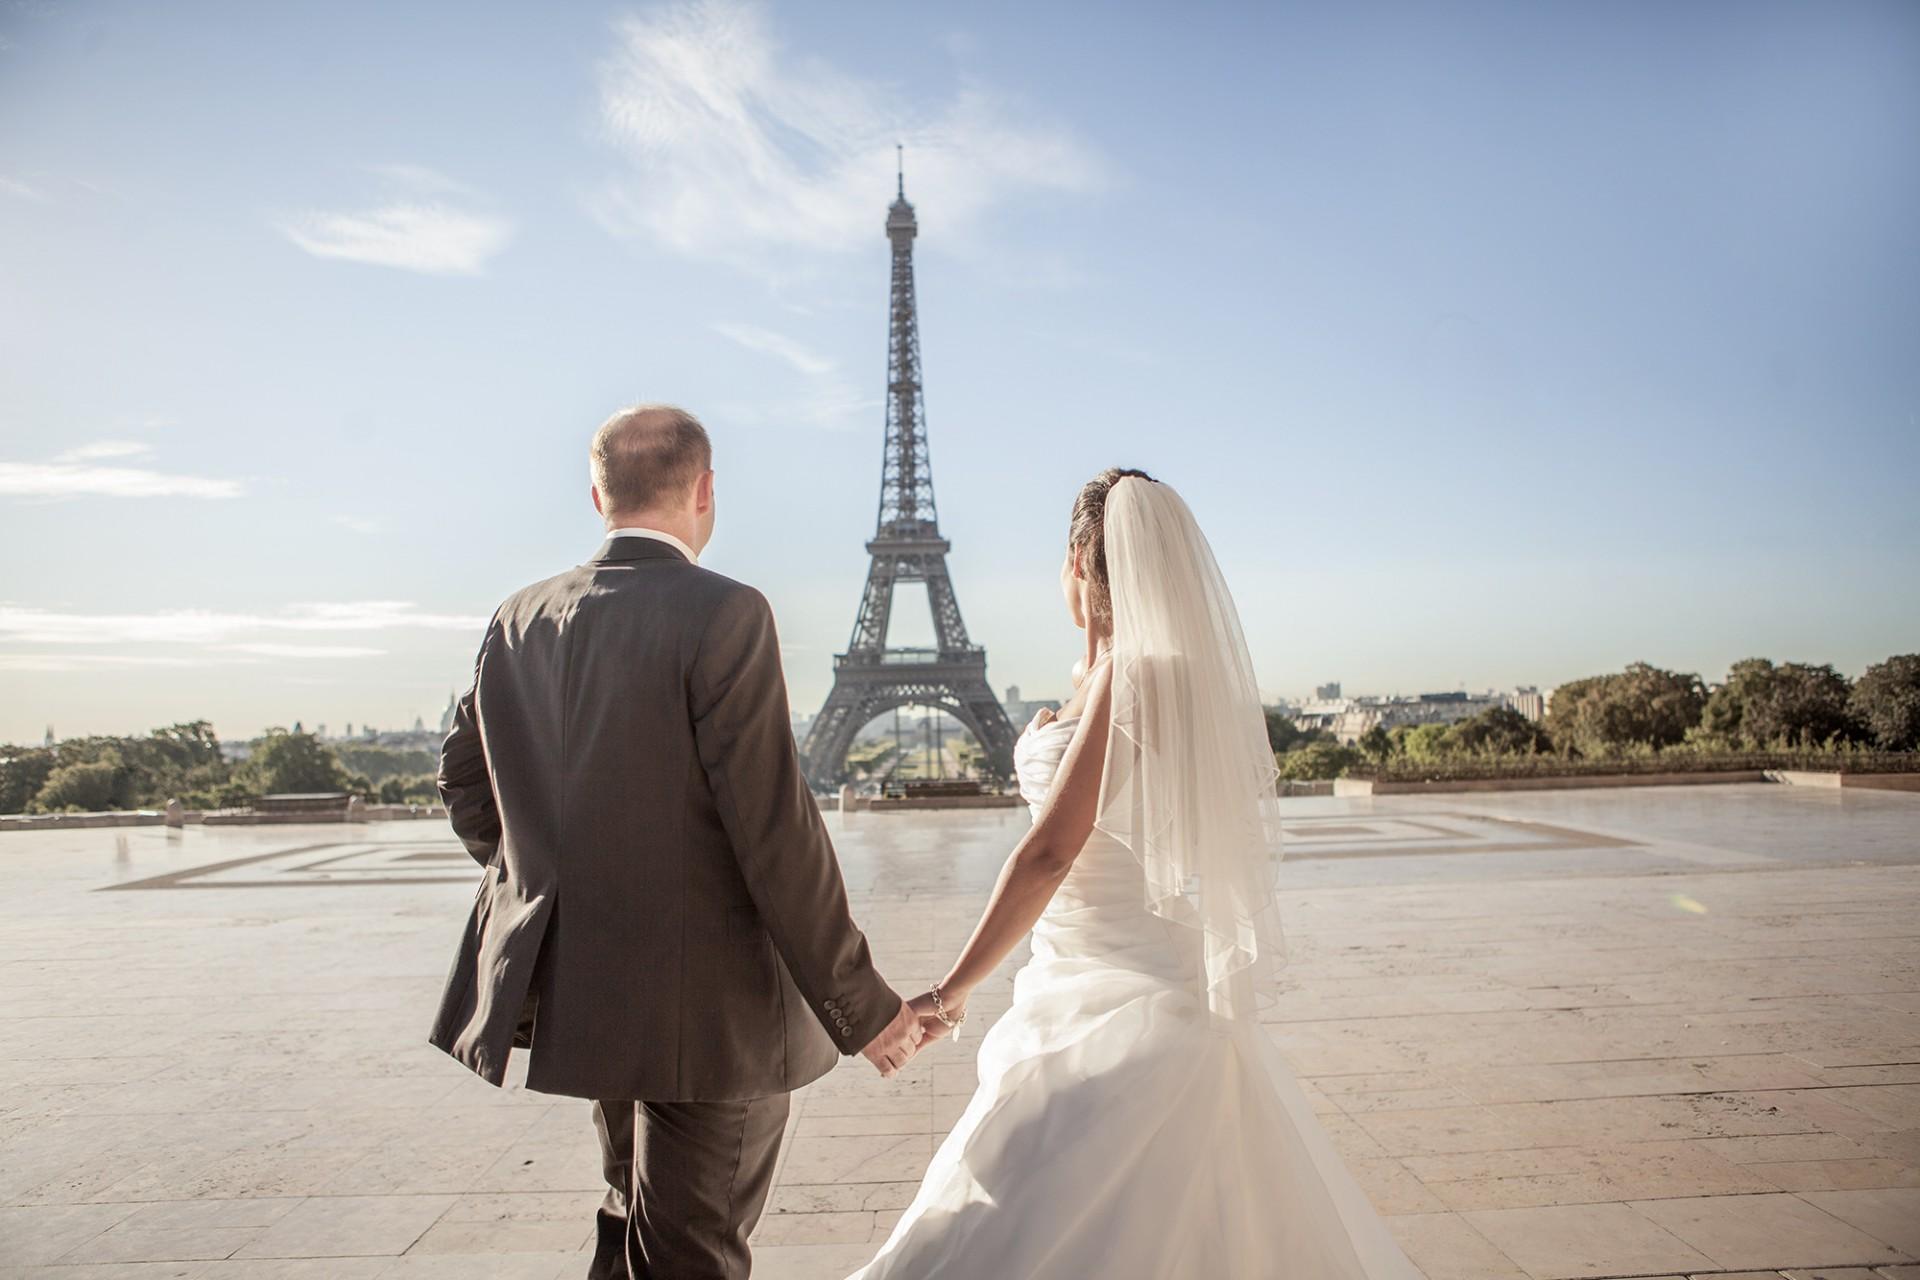 Hochzeitspaar blickt auf den Eiffelturm